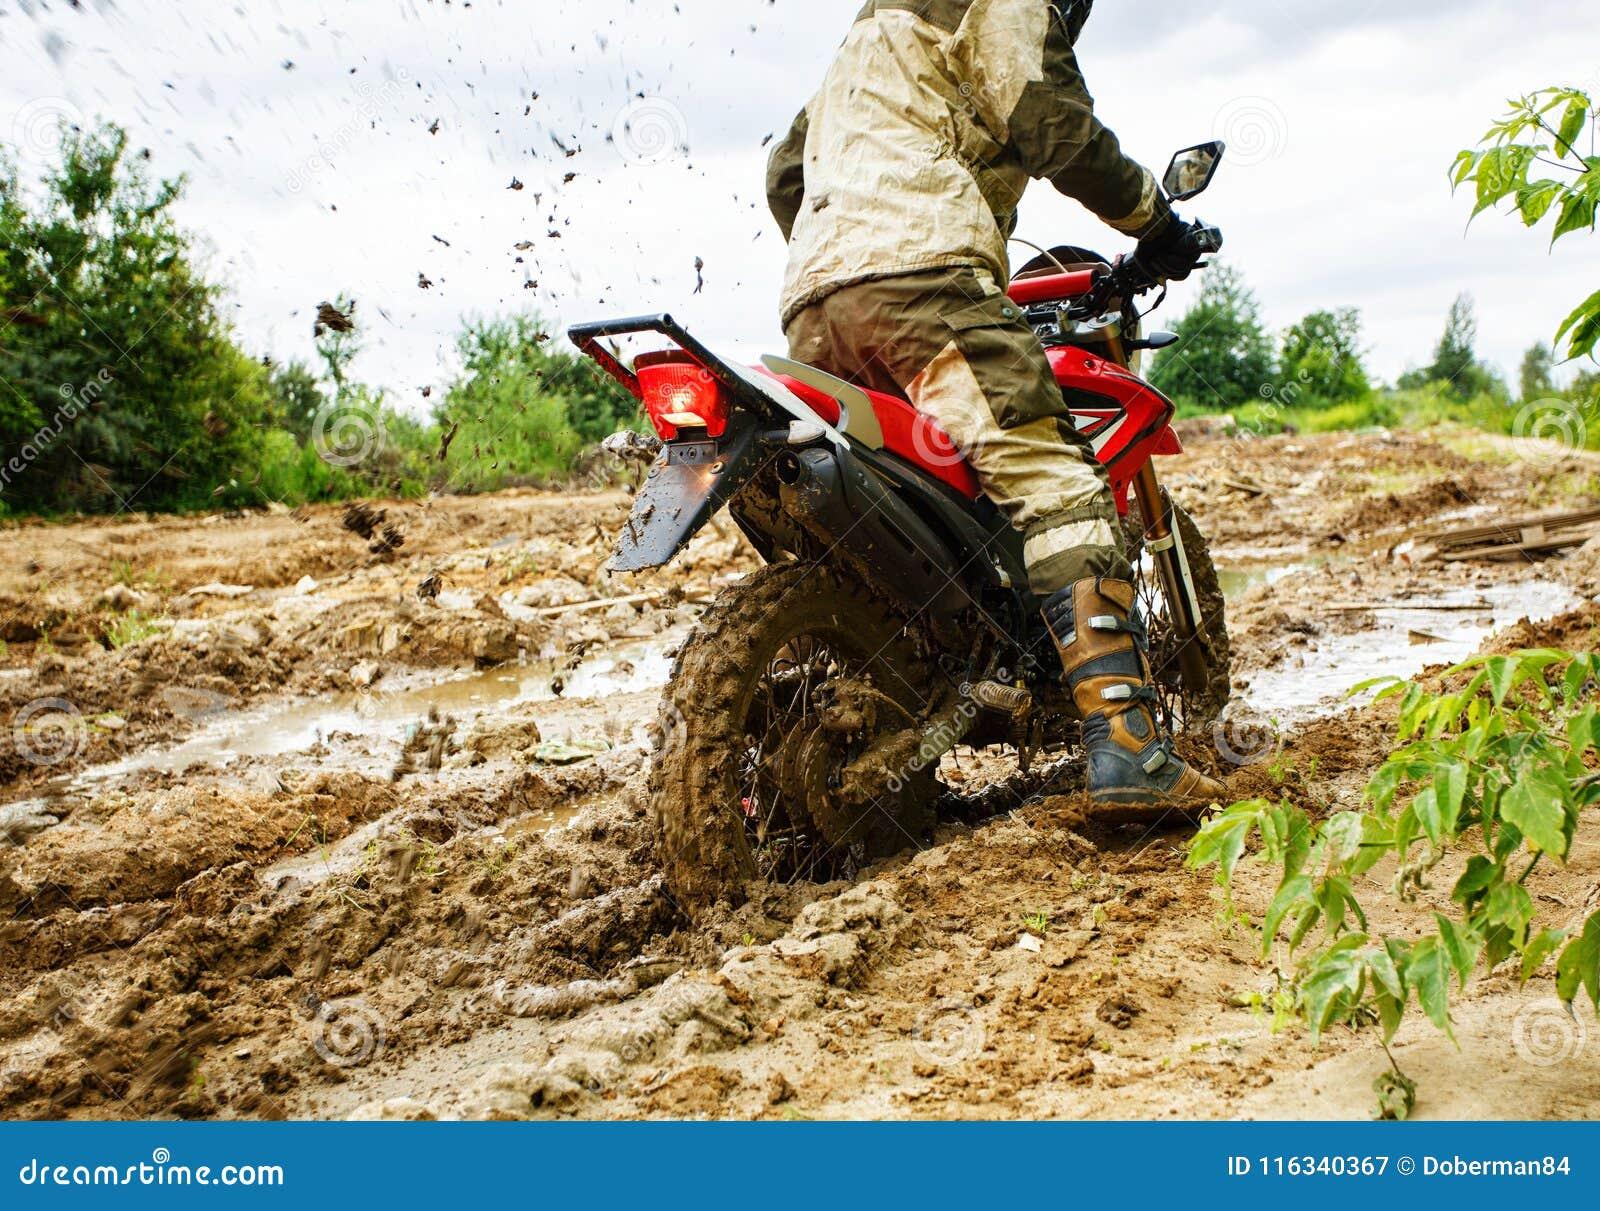 Motocross Rider Plowing Through Mud Stock Image - Image of